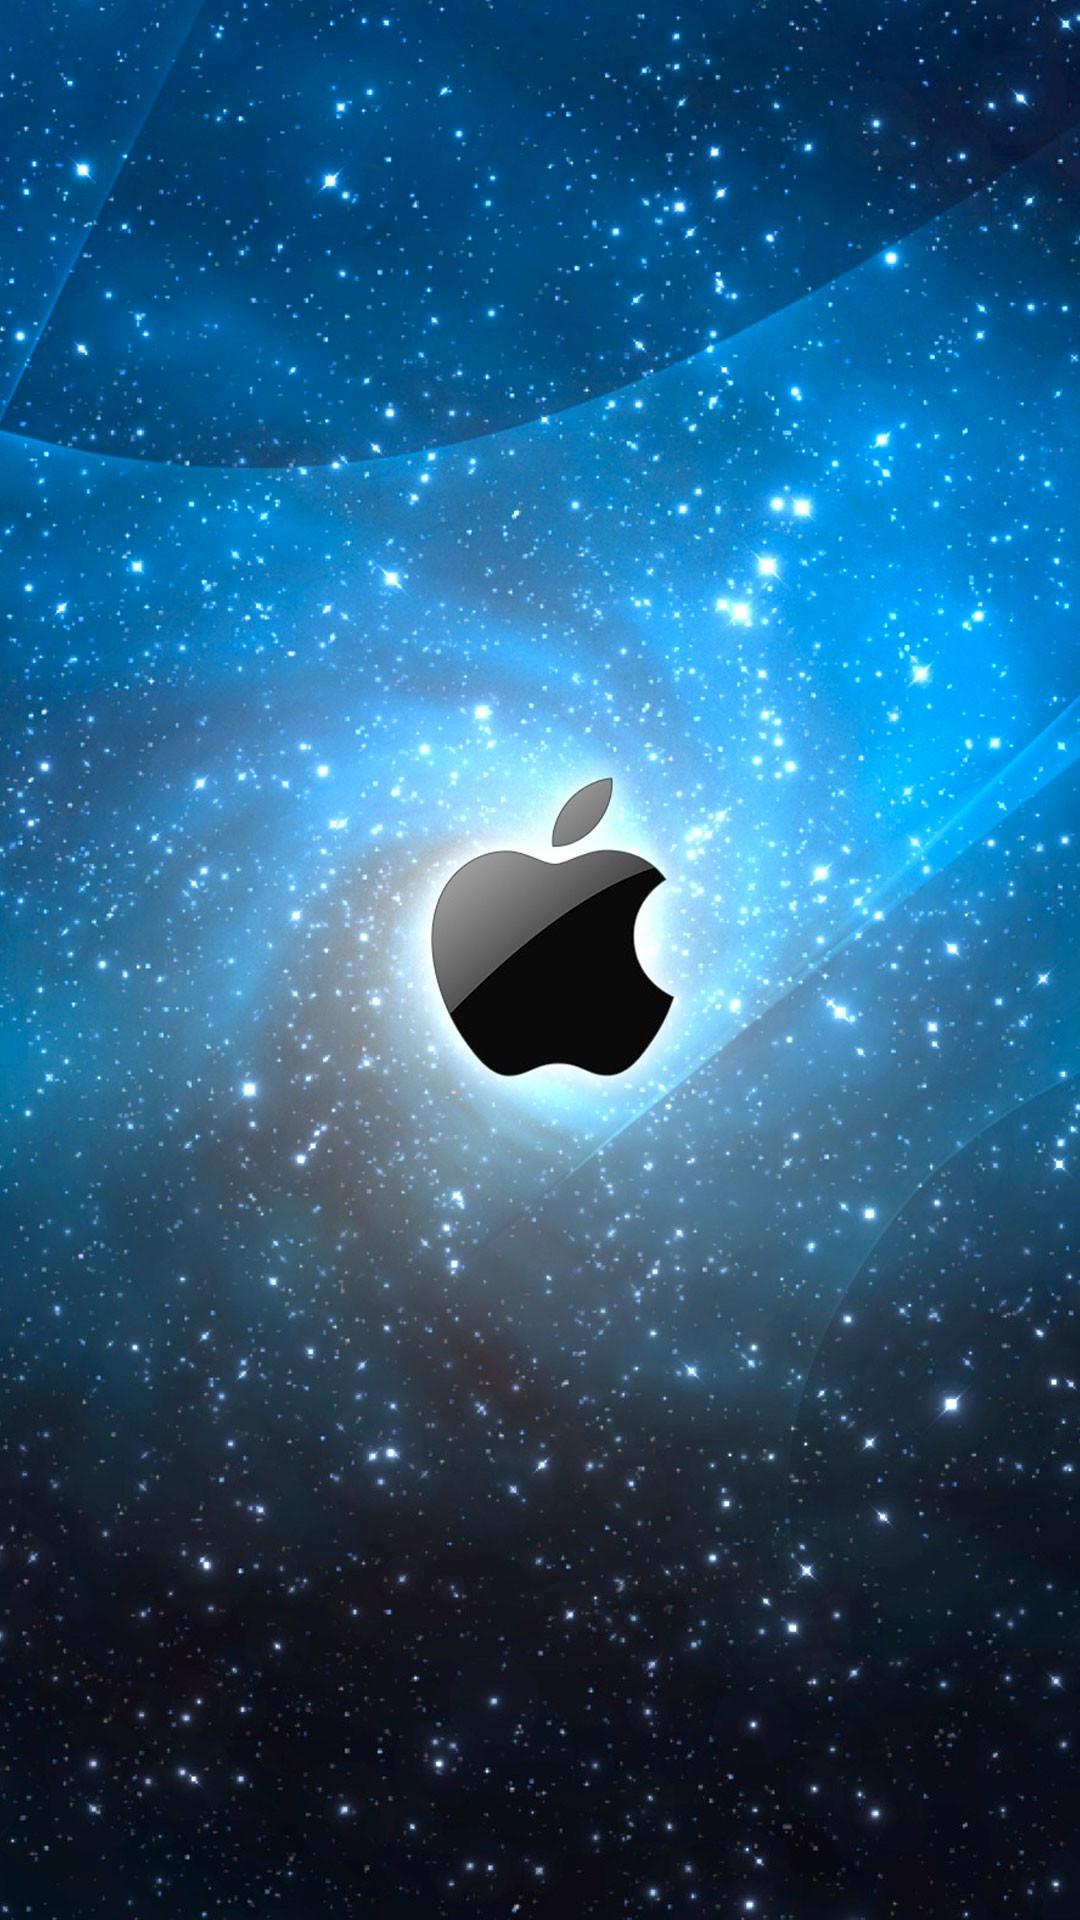 Apple iPhone 6 Plus wallpaper official